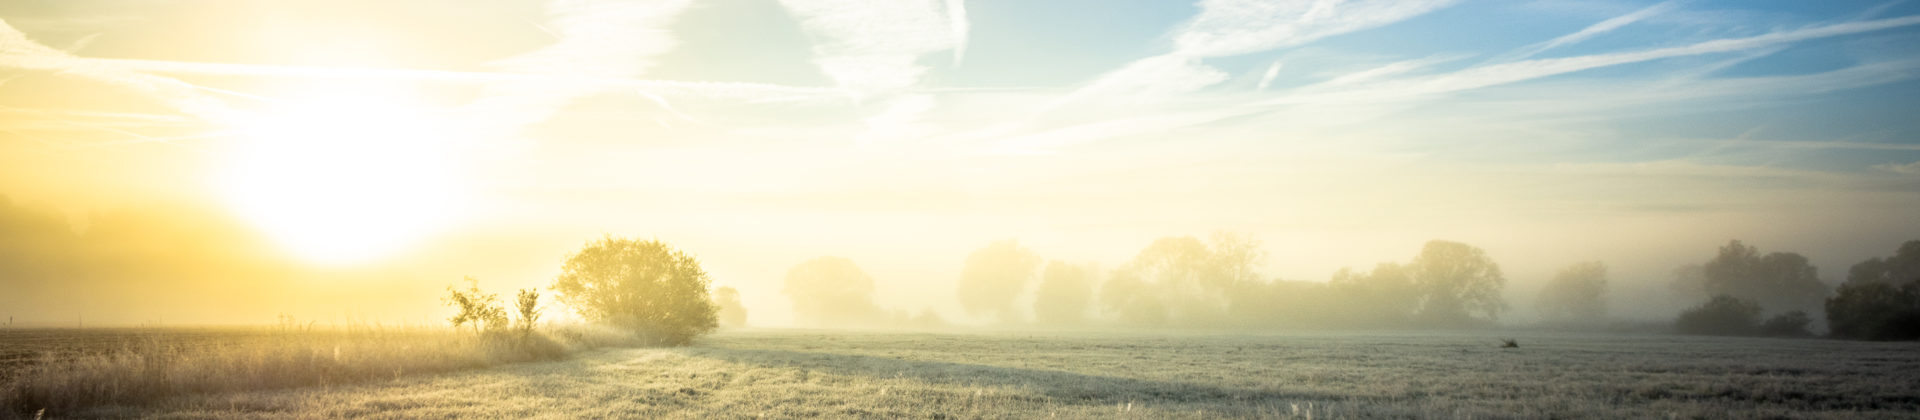 Verlassene Orte – Der verlassene Bauernhof